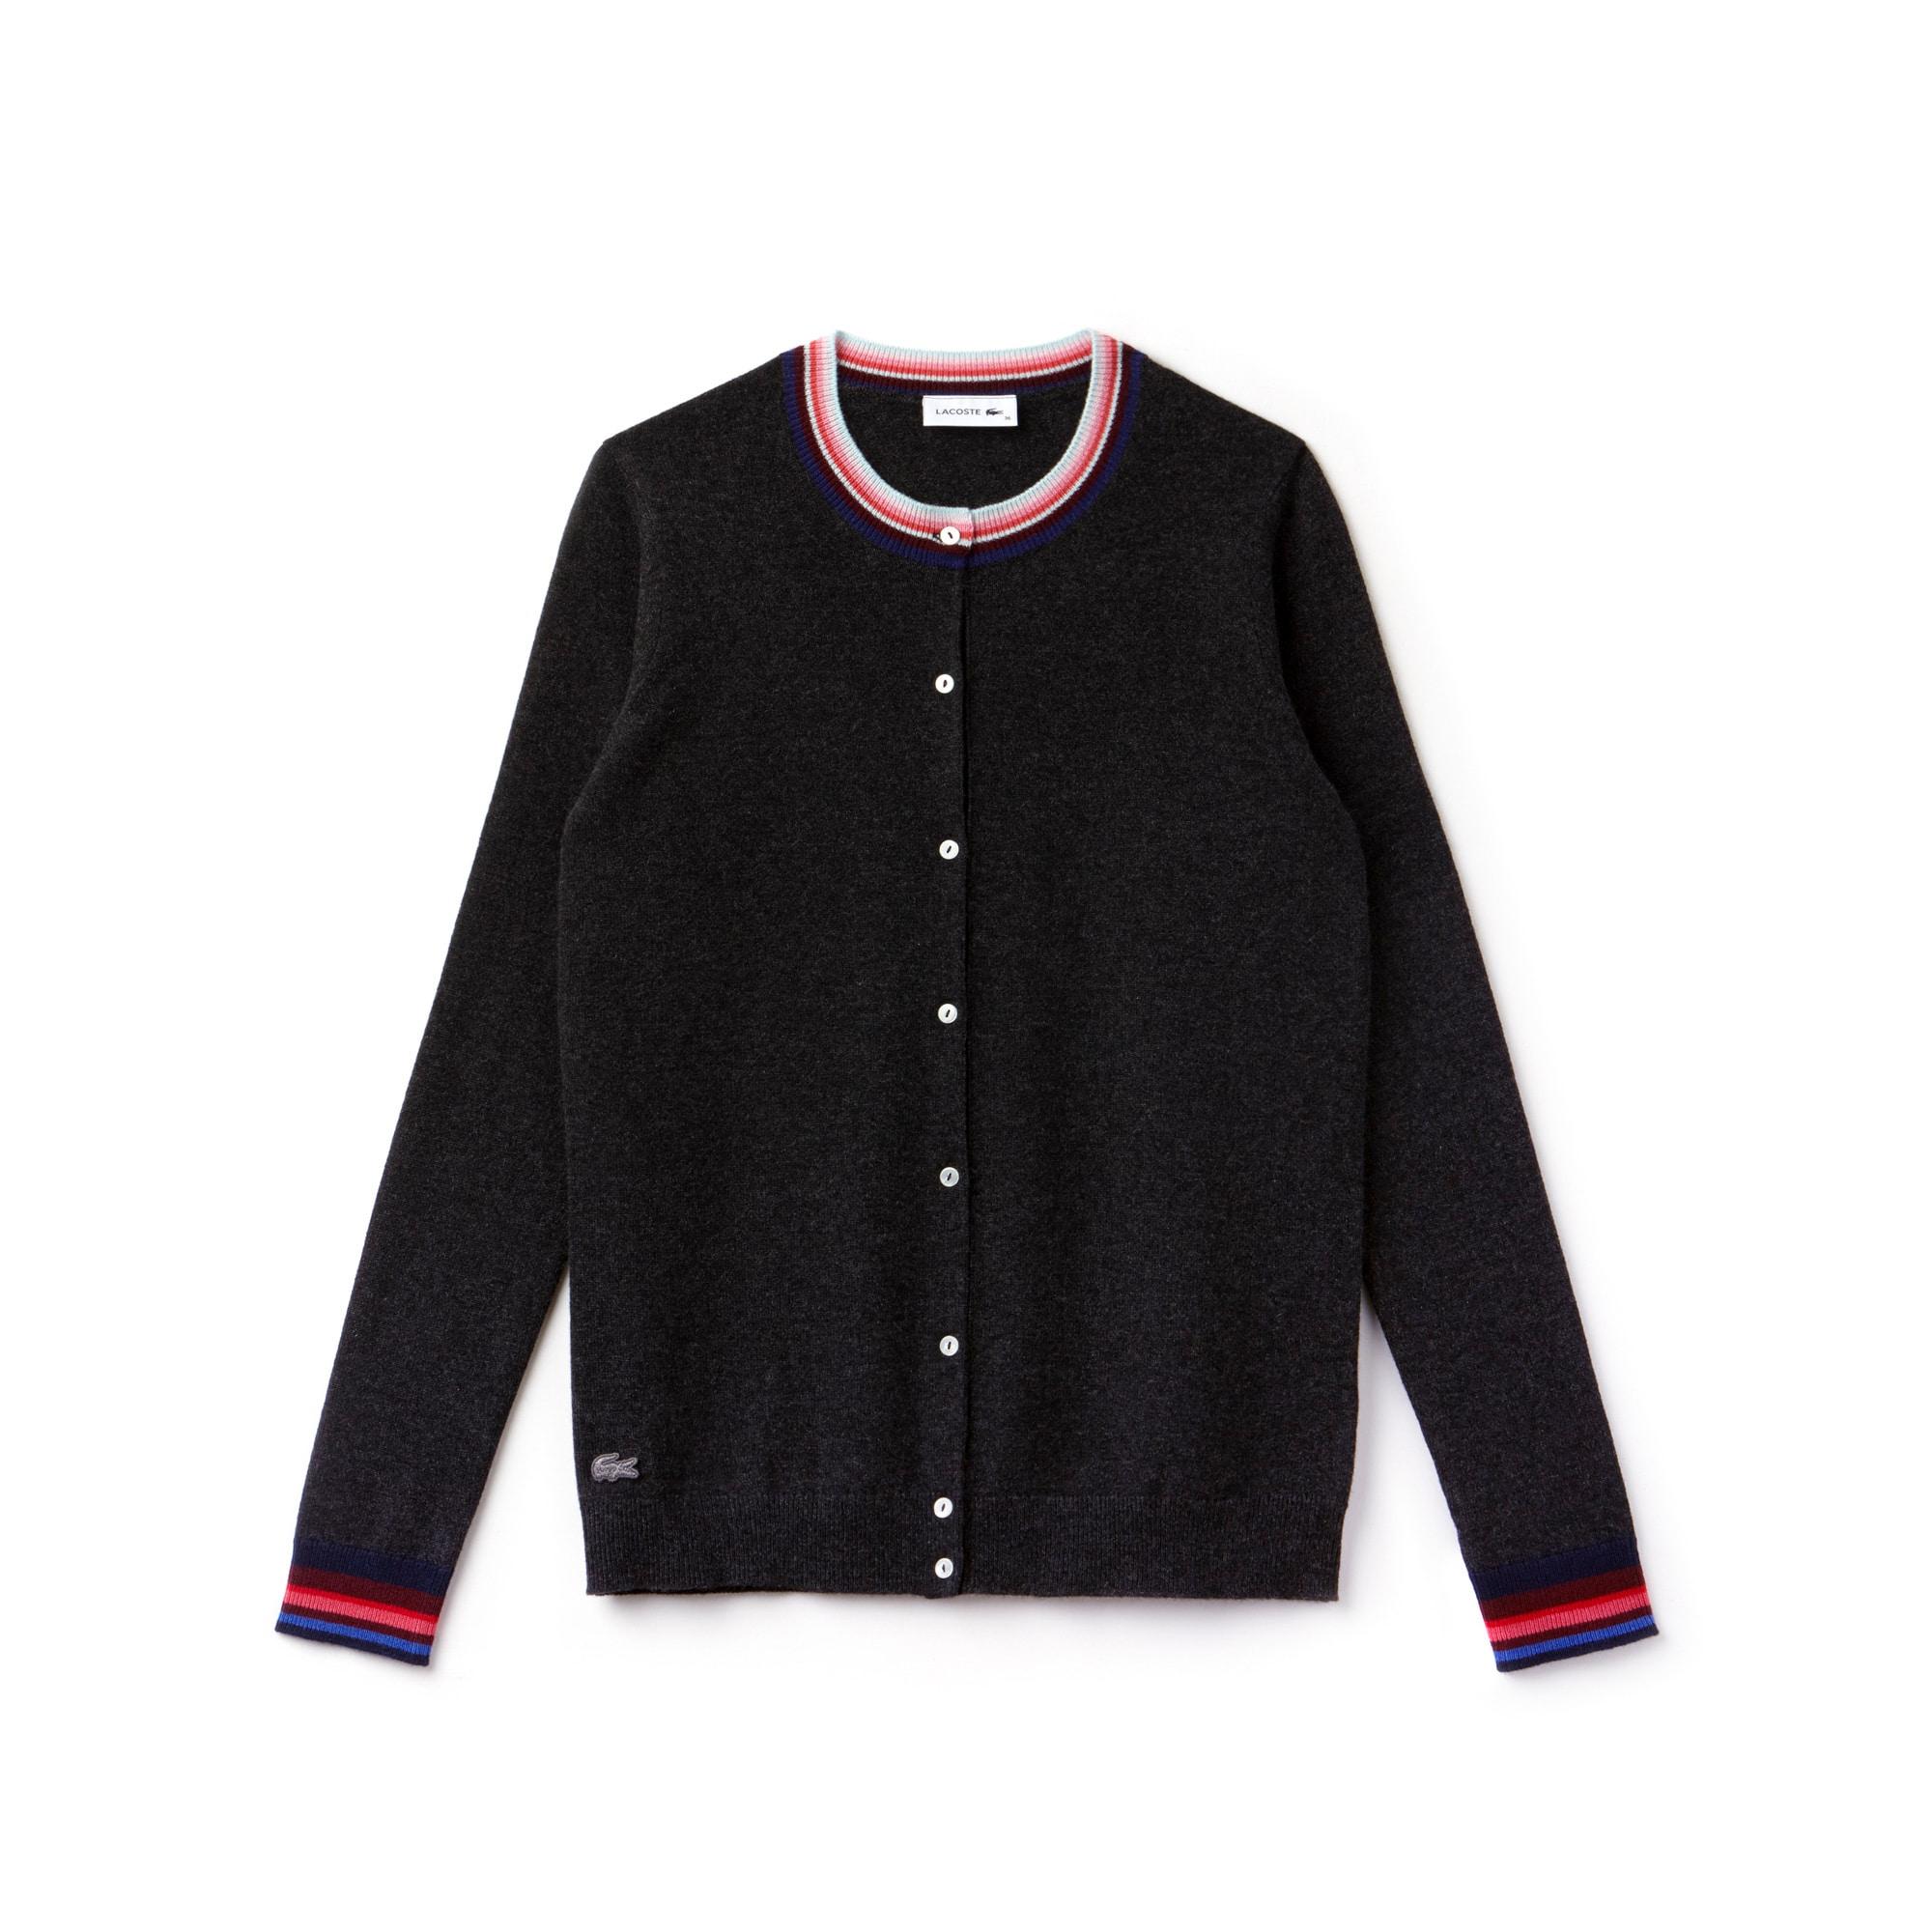 596c60b5 Women's Cashmere Jersey Striped Details Cardigan Women's Cashmere Jersey  Striped Details Cardigan